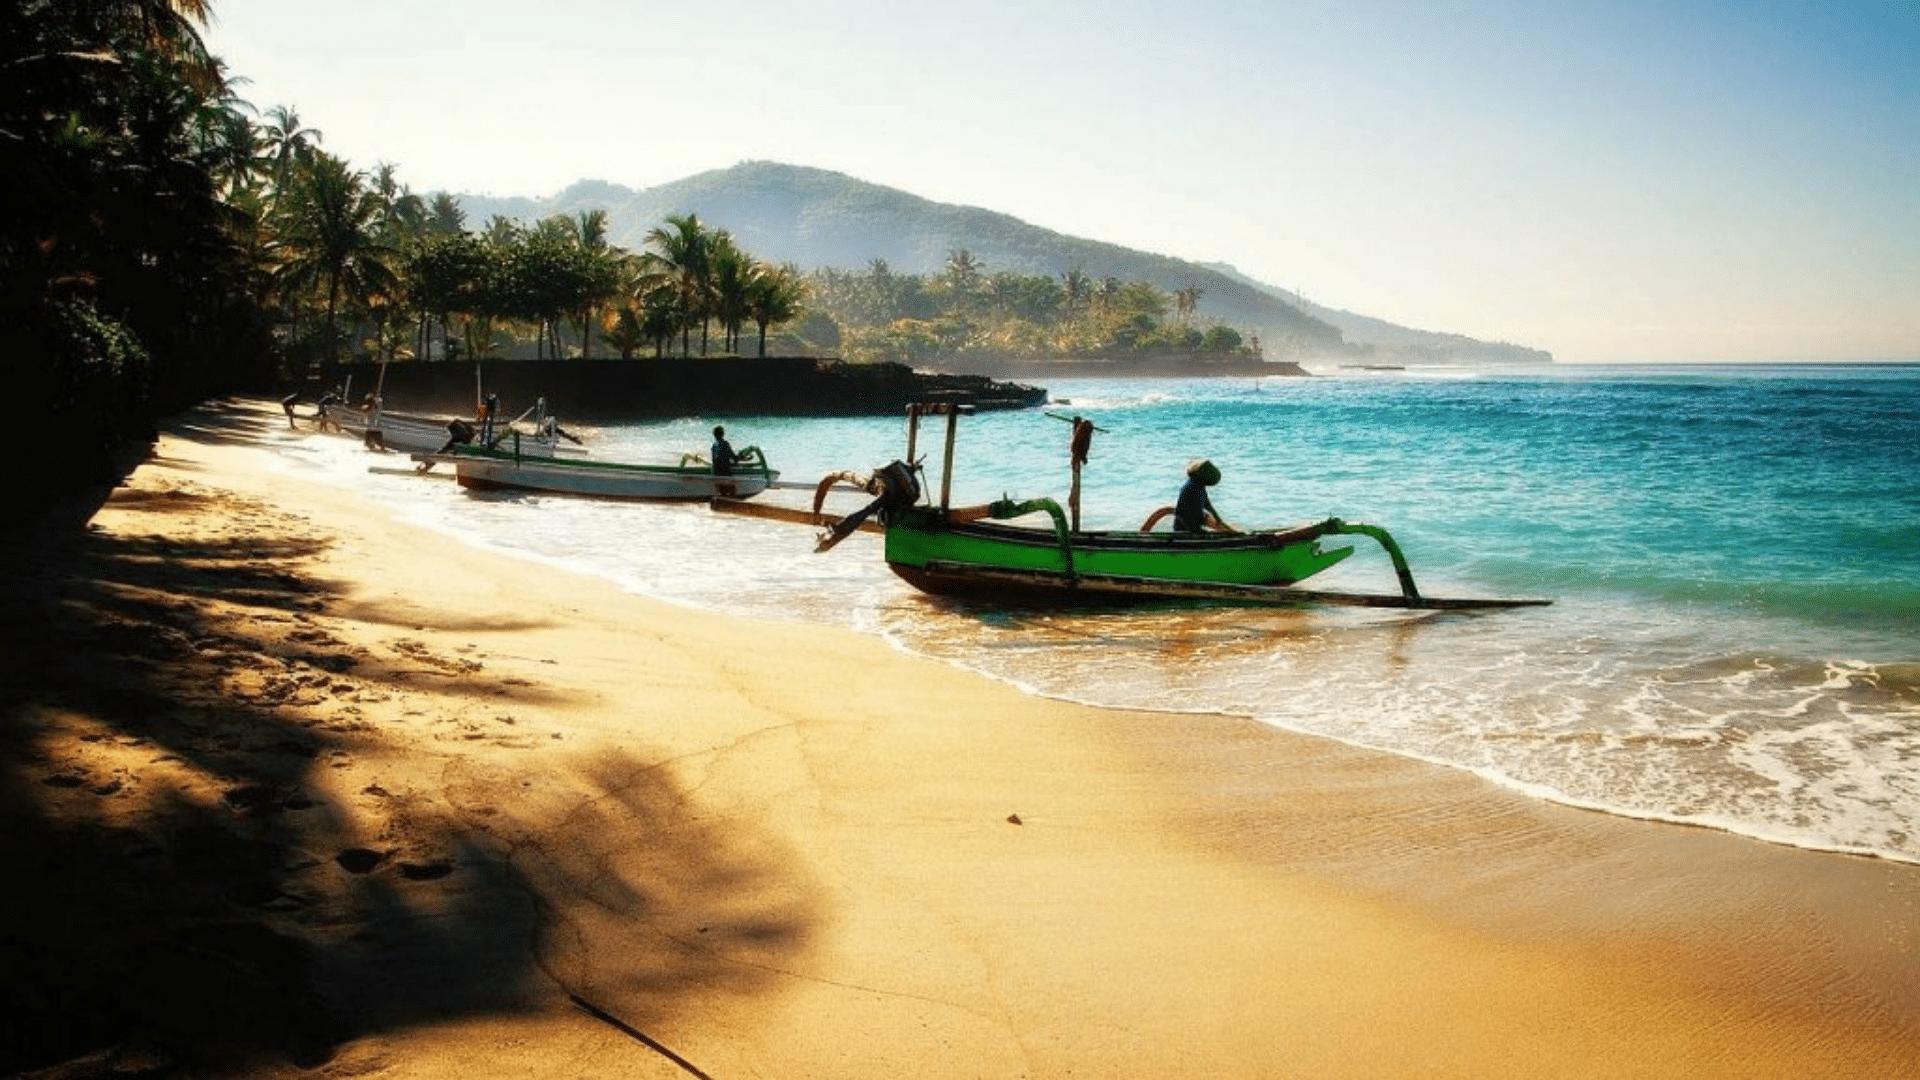 Indonesien, Bali